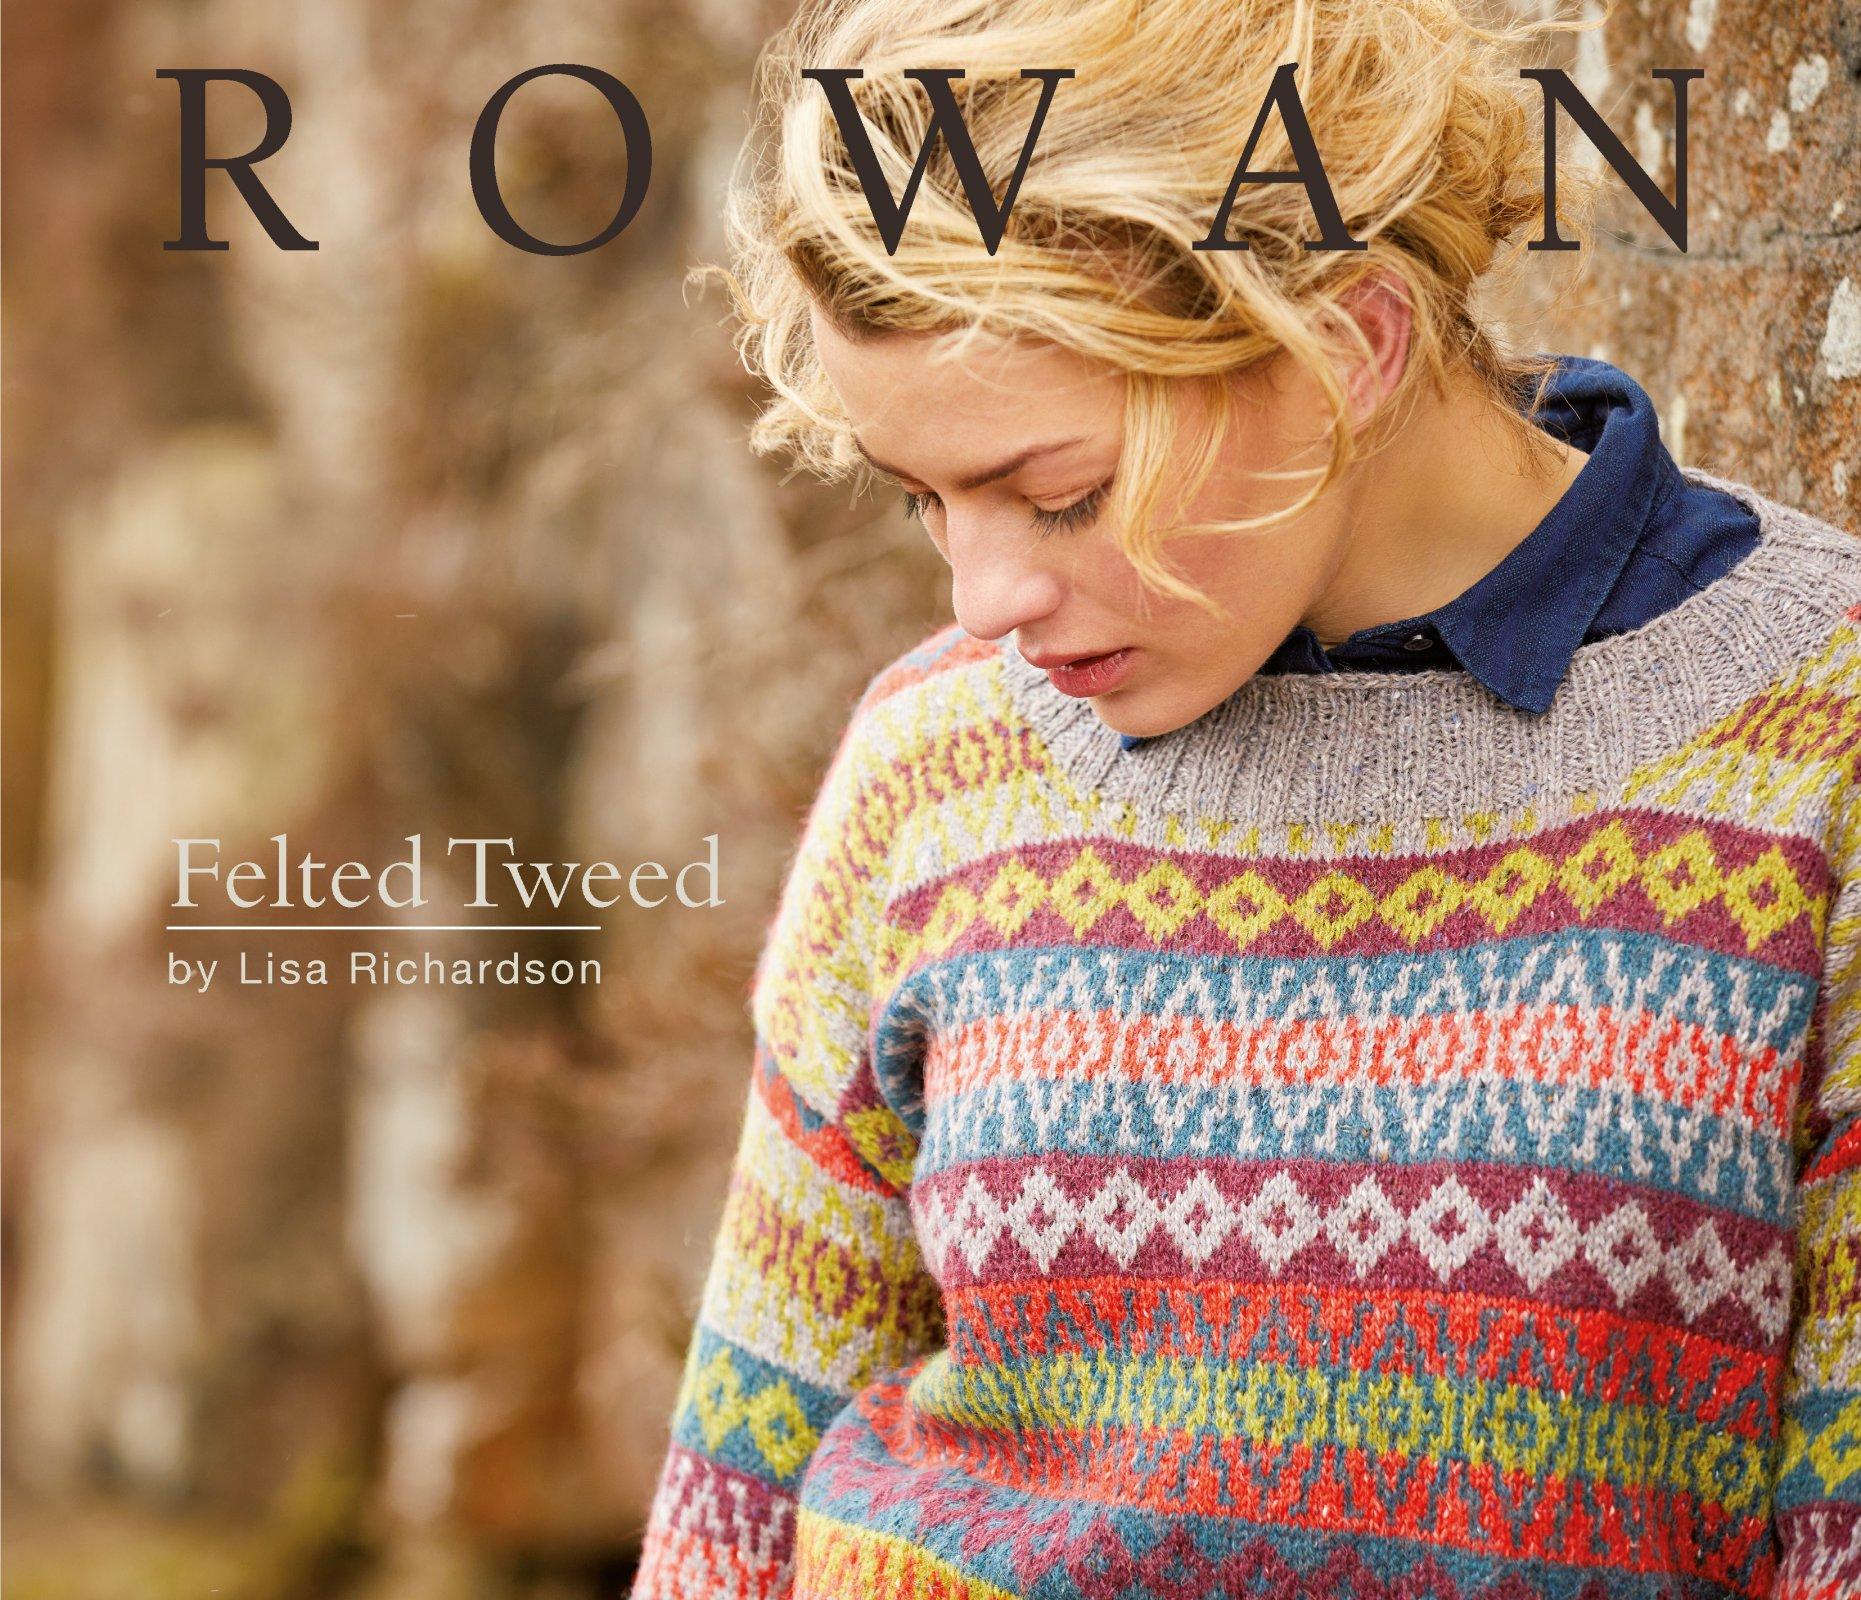 Rowan Felted Tweed Pattern Book by Lisa Richardson